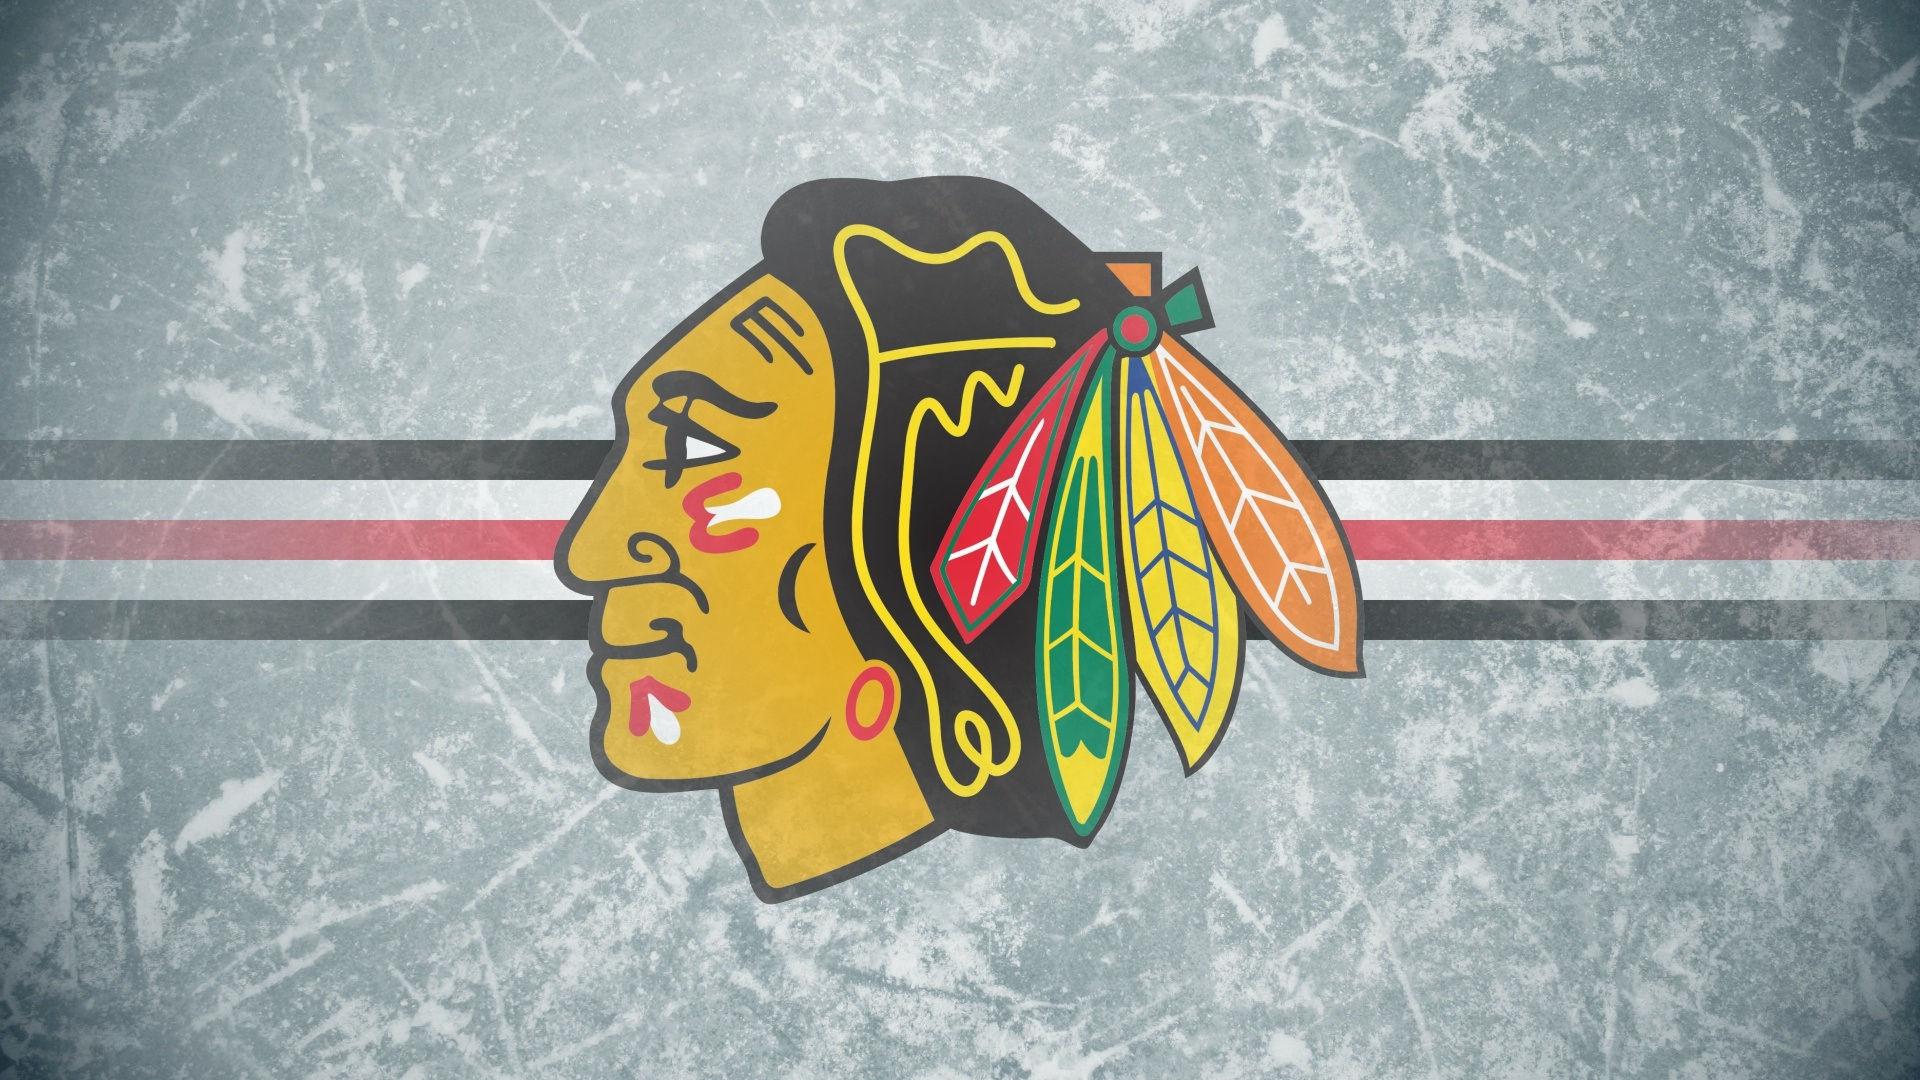 Wallpapers Blackhawks de Chicago - MaximumWall